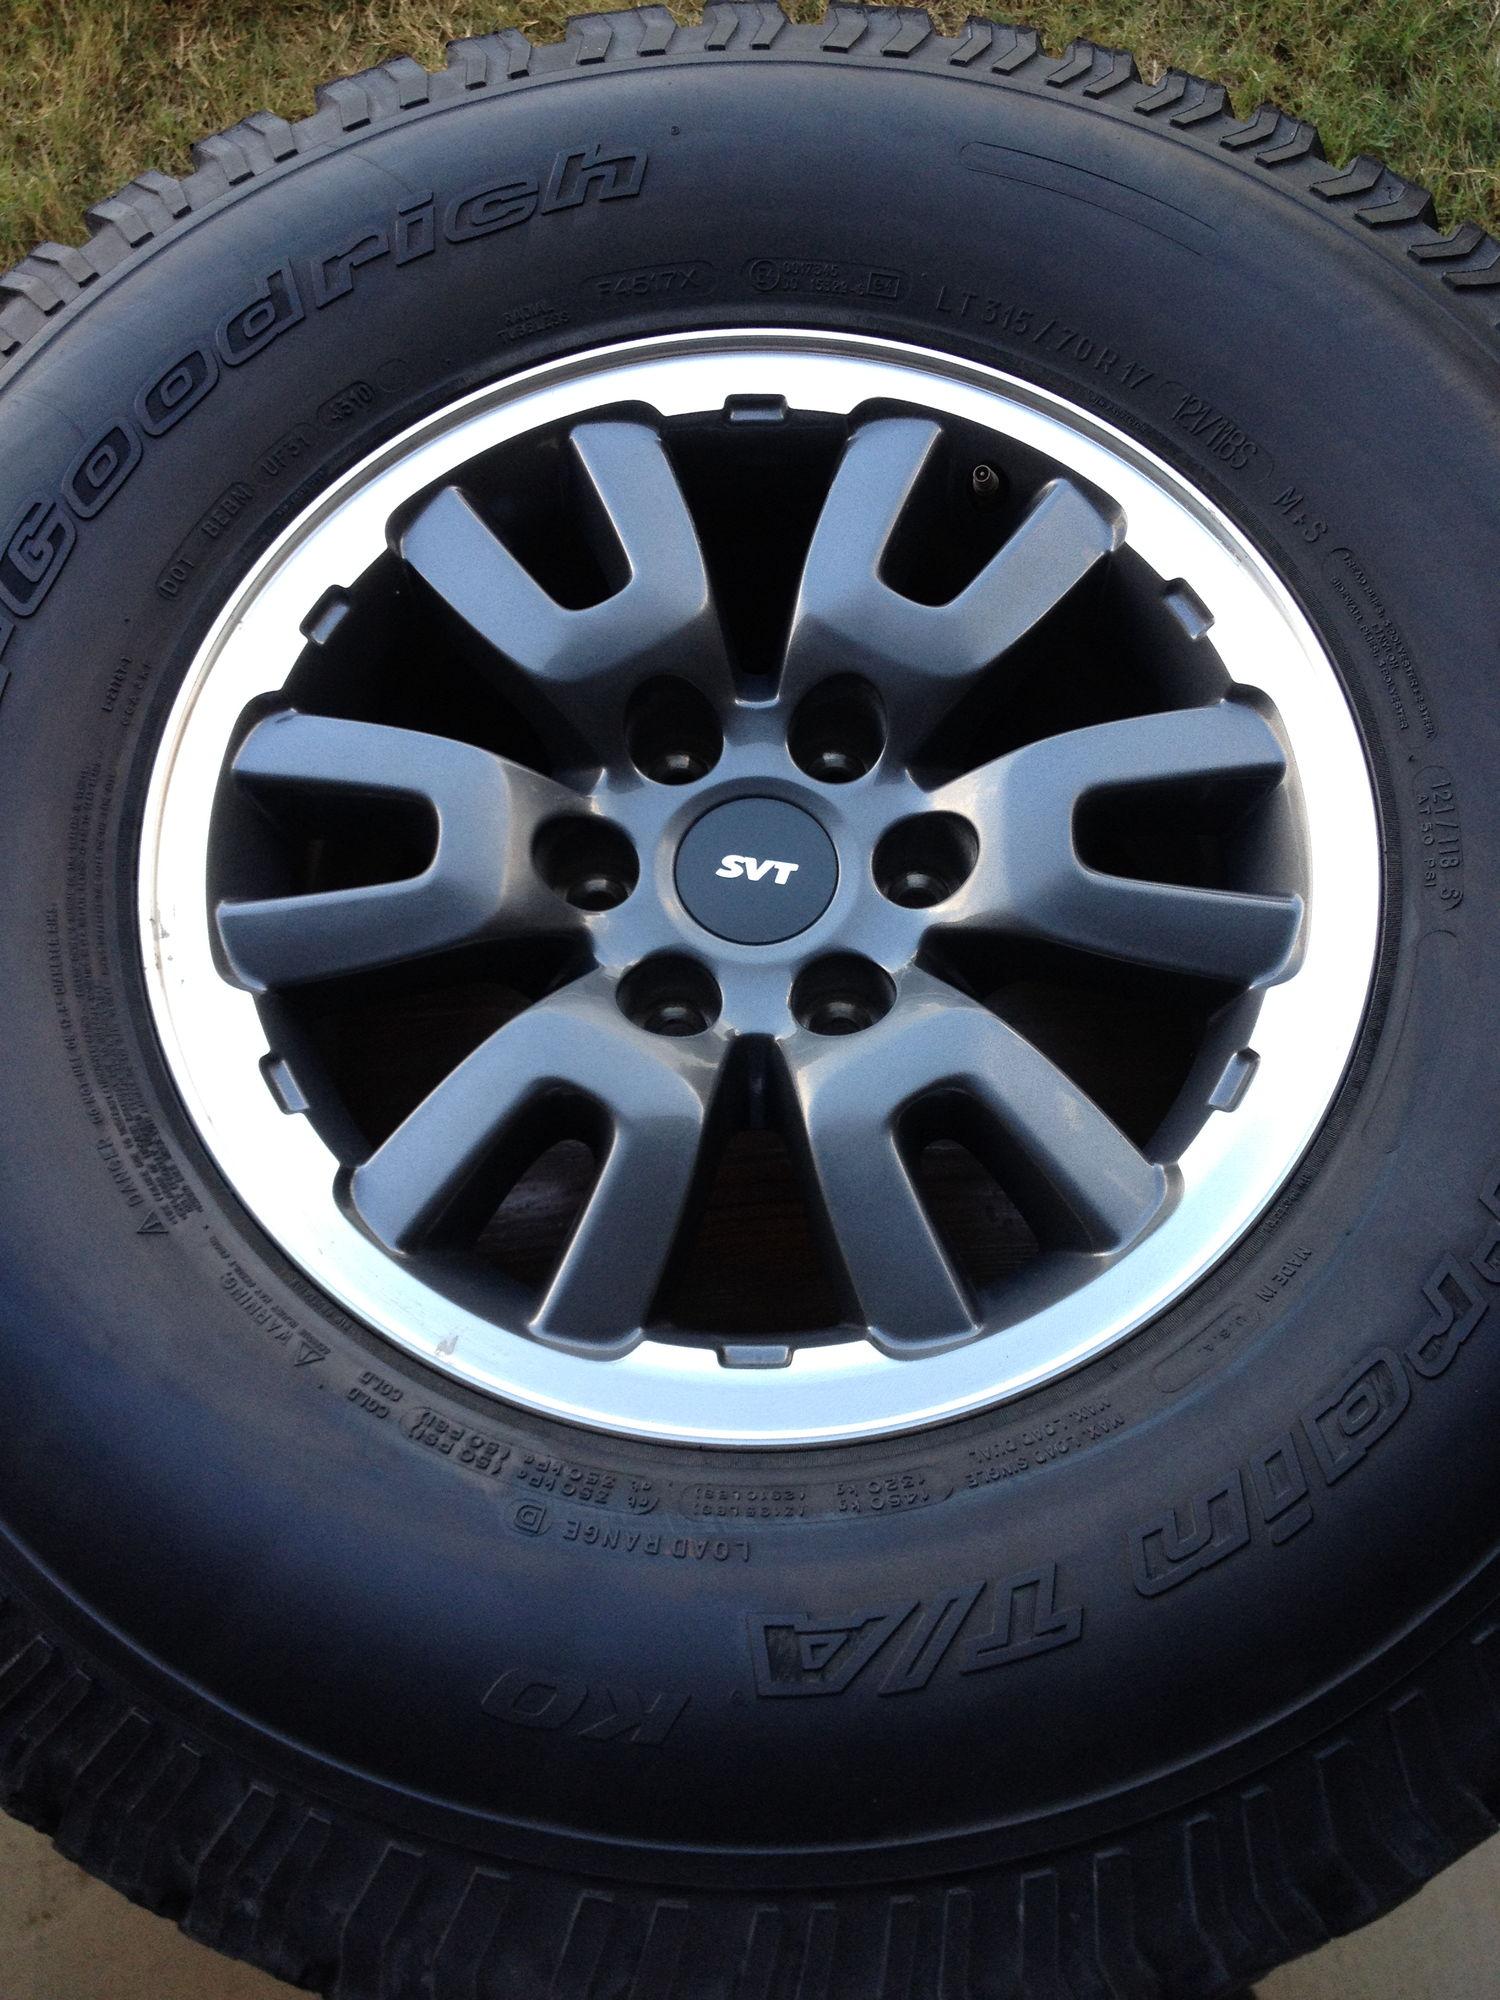 Southeast Raptor Svt Wheels 1st Gen Ford F150 Forum